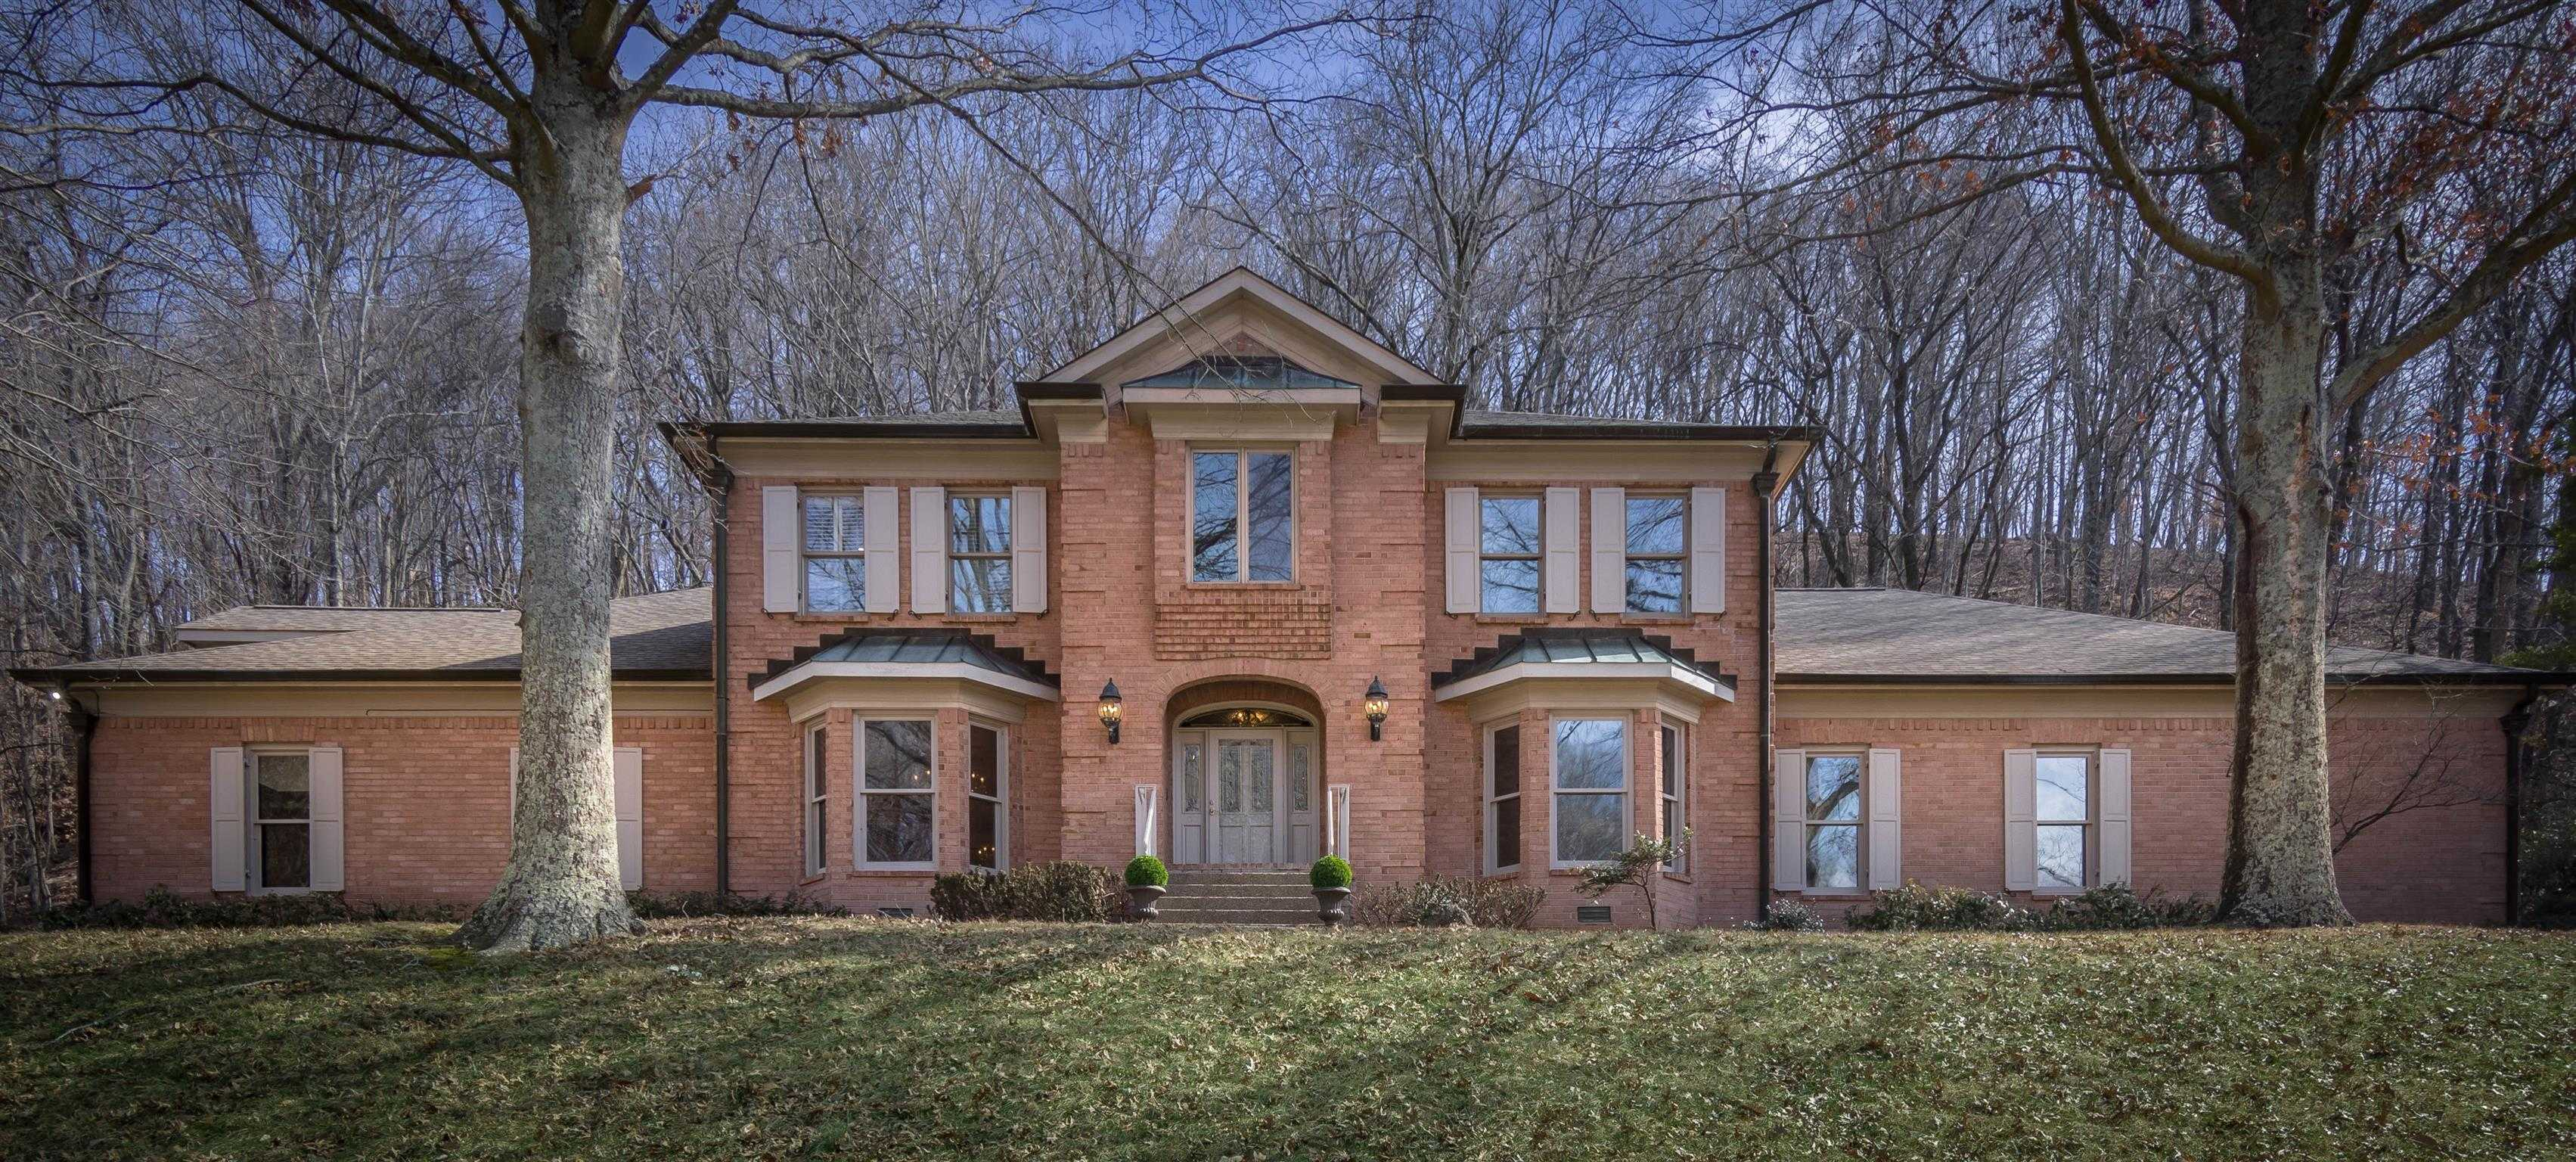 $1,350,000 - 5Br/5Ba -  for Sale in Lynnwood Downs, Franklin